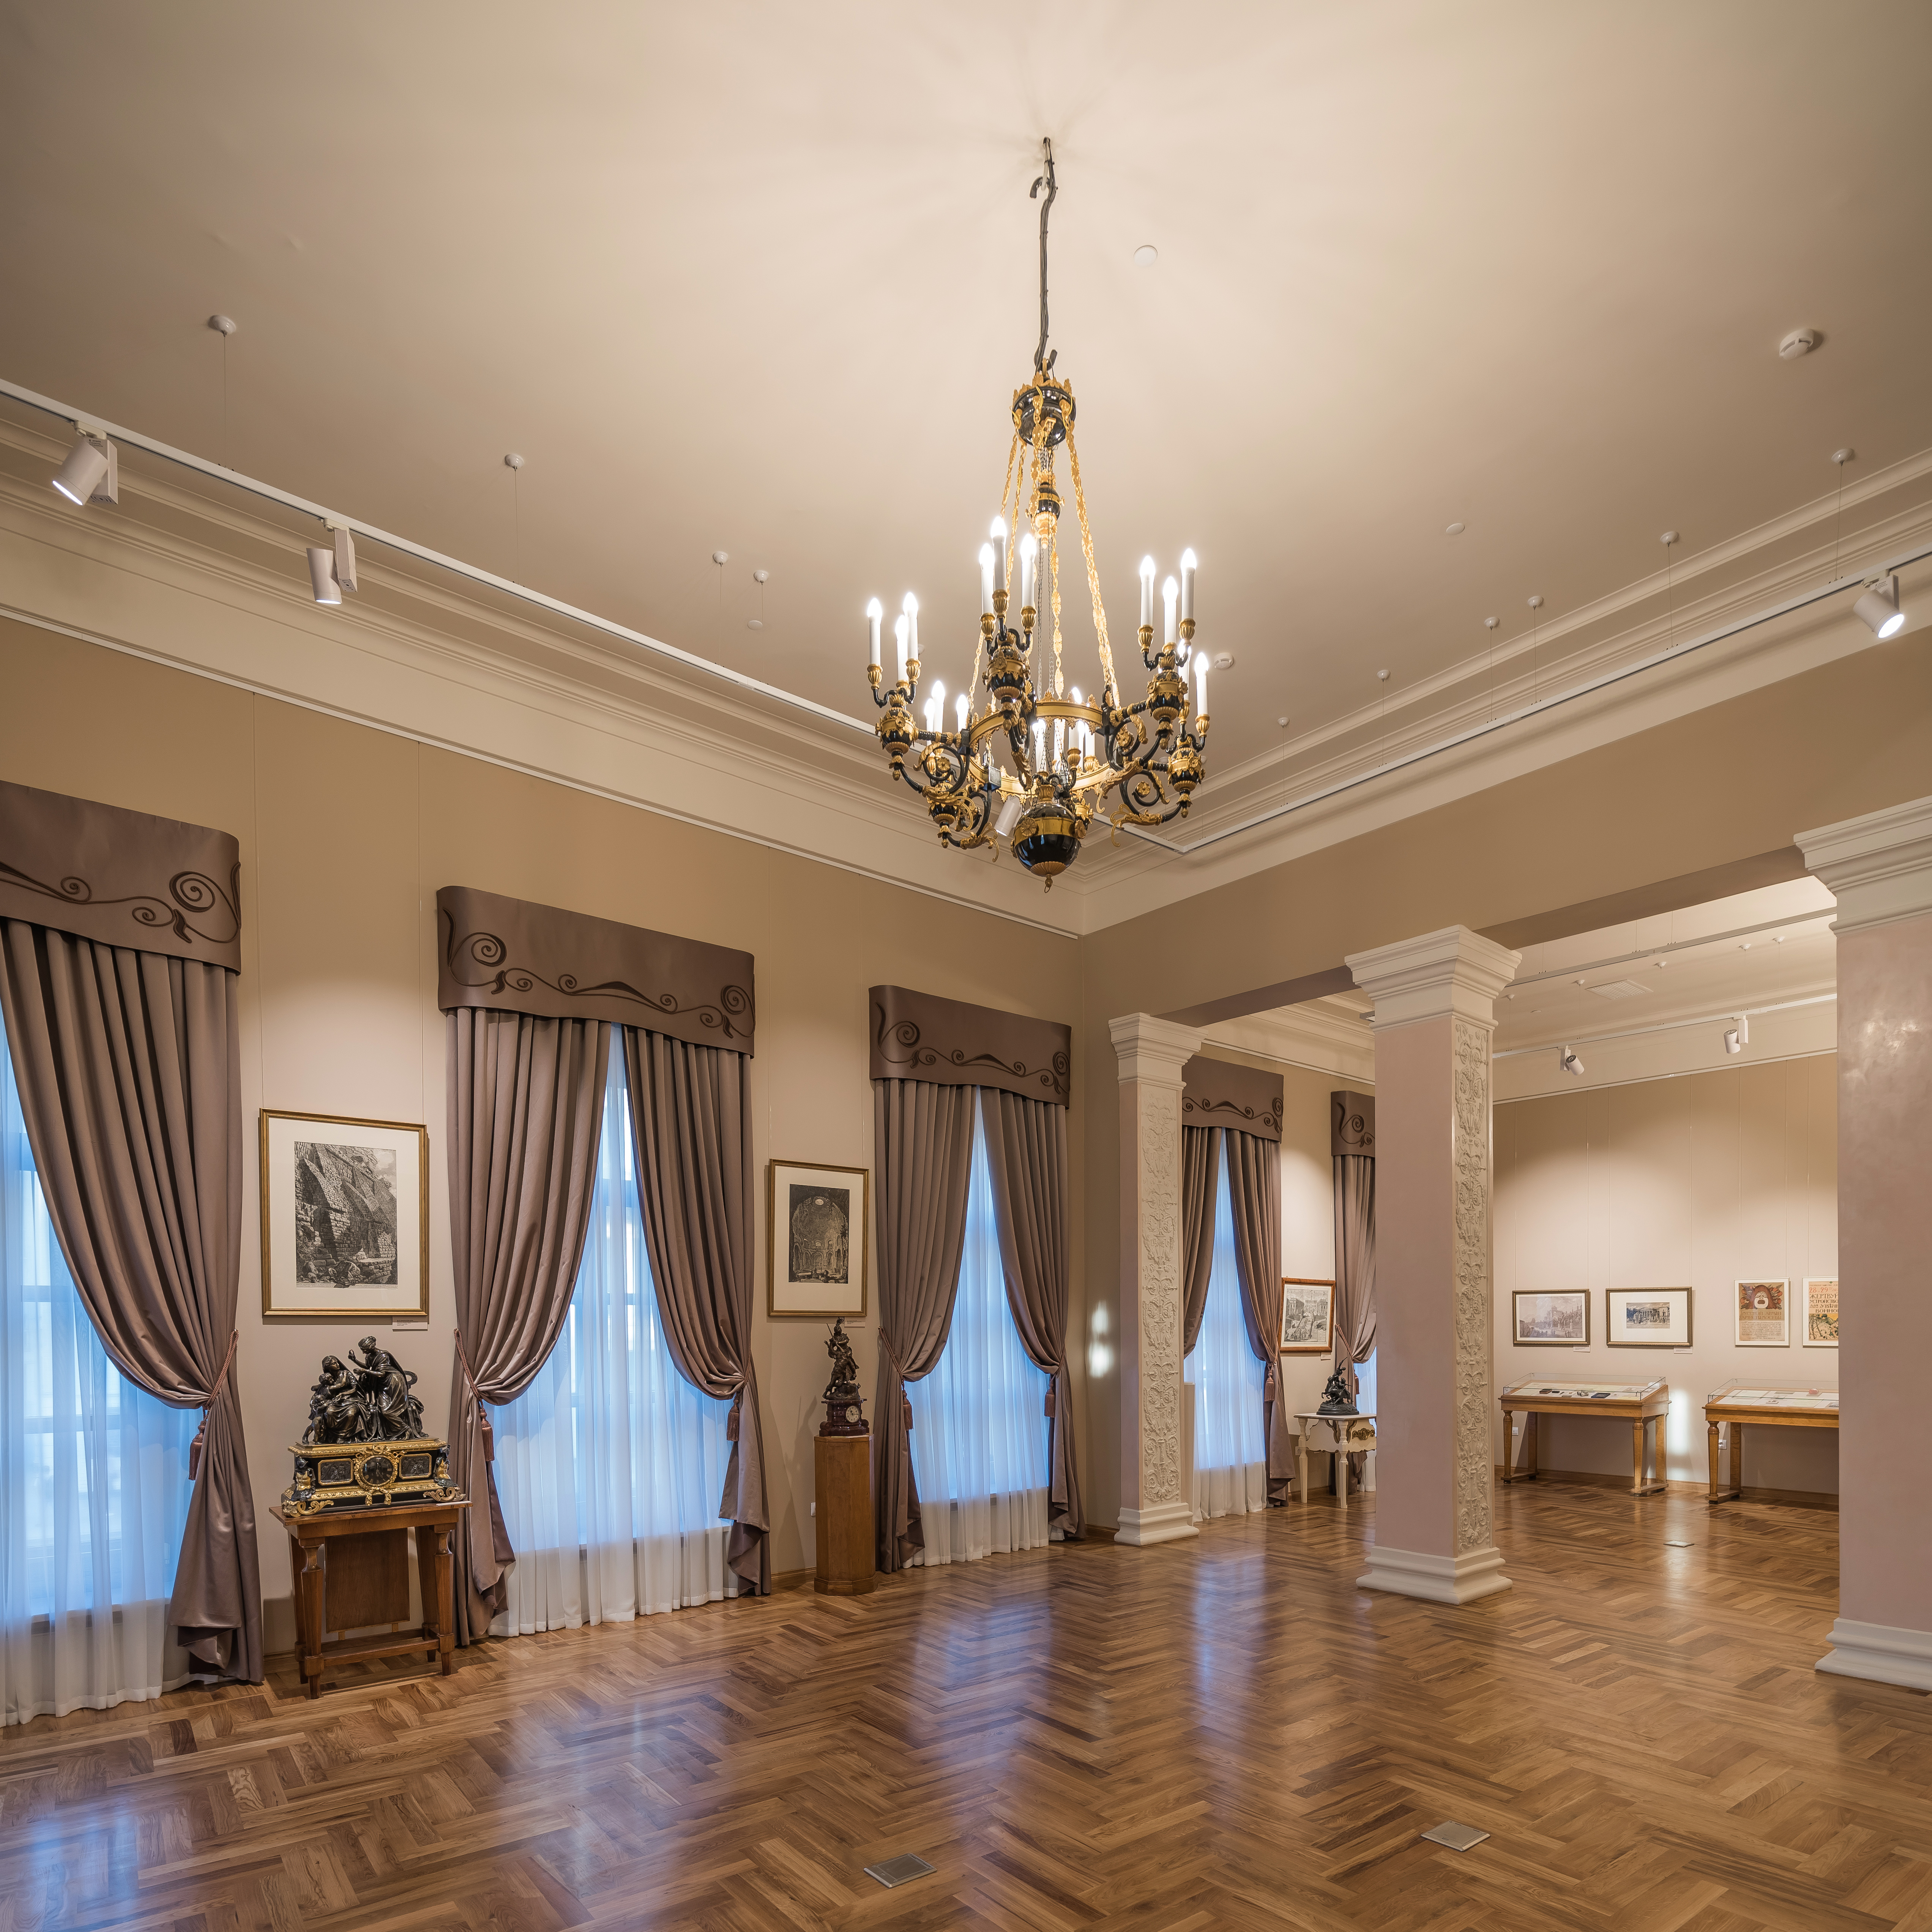 клуб при музее в москве